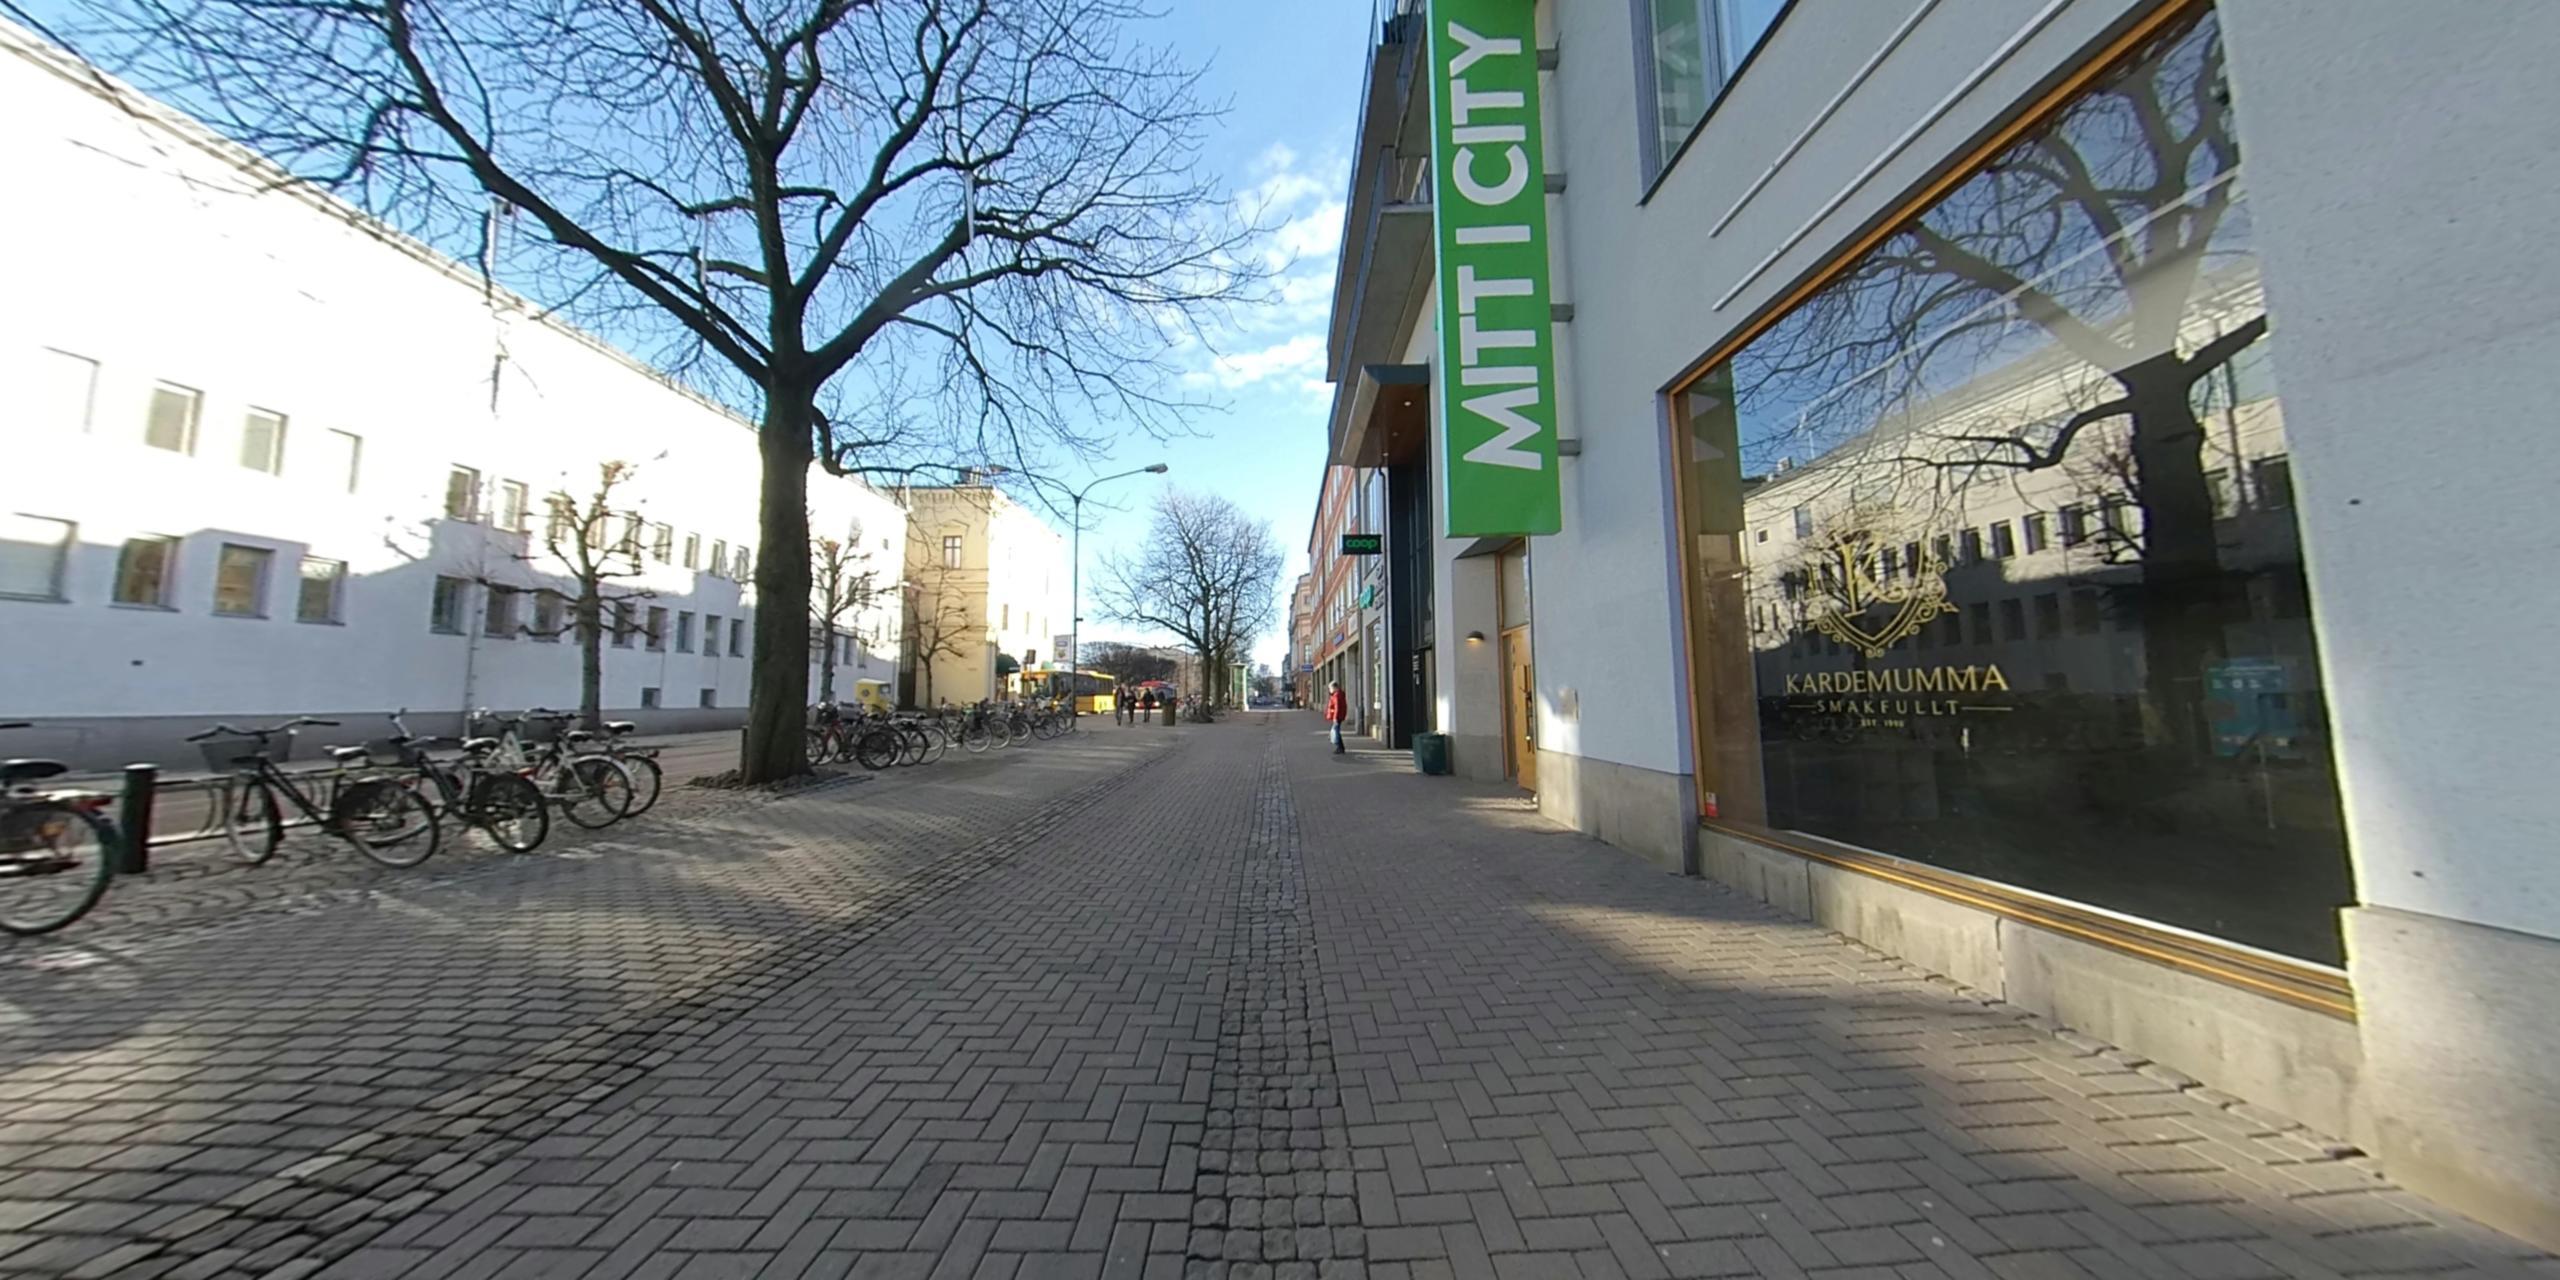 Mitt I City Google tour